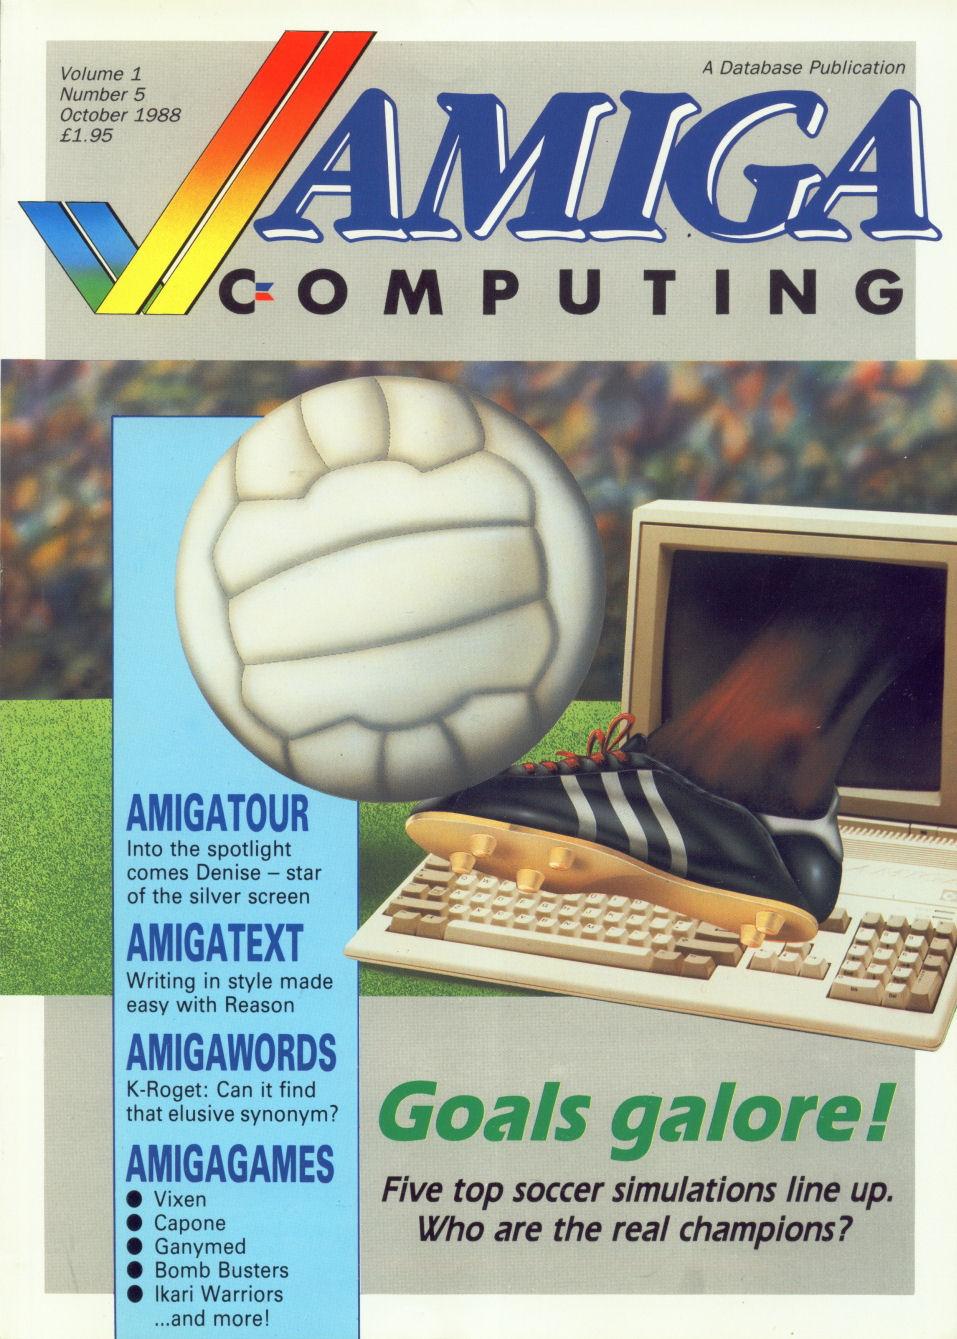 Amiga action magazine download | Pw atkins download